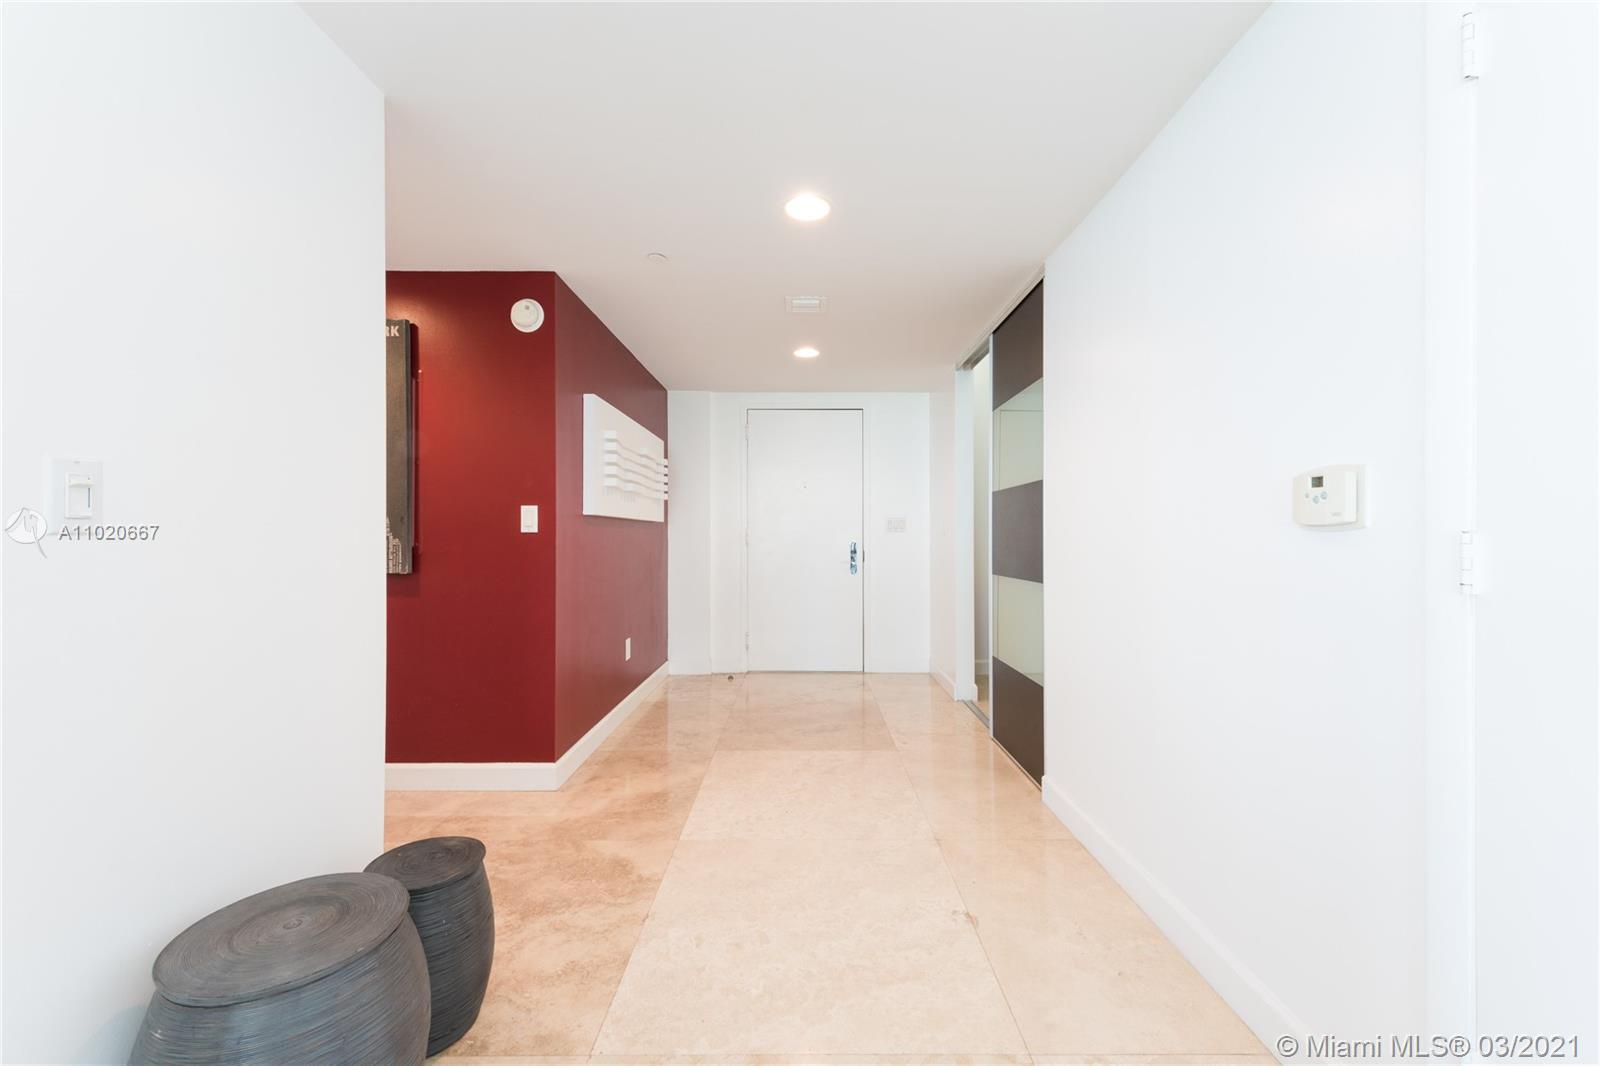 1401 3 / 3 2065 sq. ft. $ 2021-04-16 0 Photo